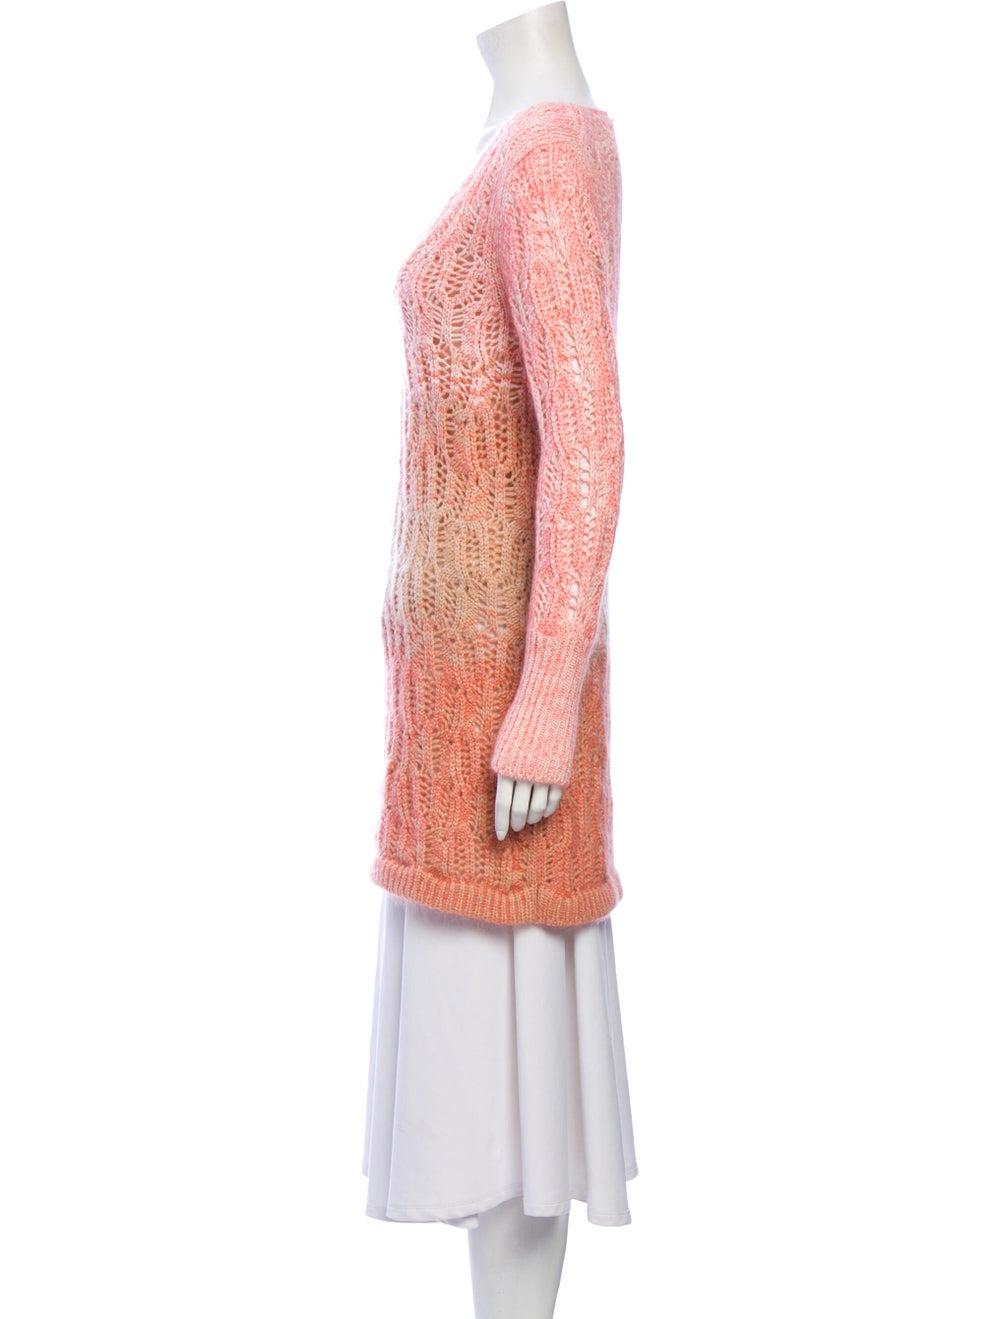 Missoni Cashmere Tie-Dye Print Sweater Pink - image 2